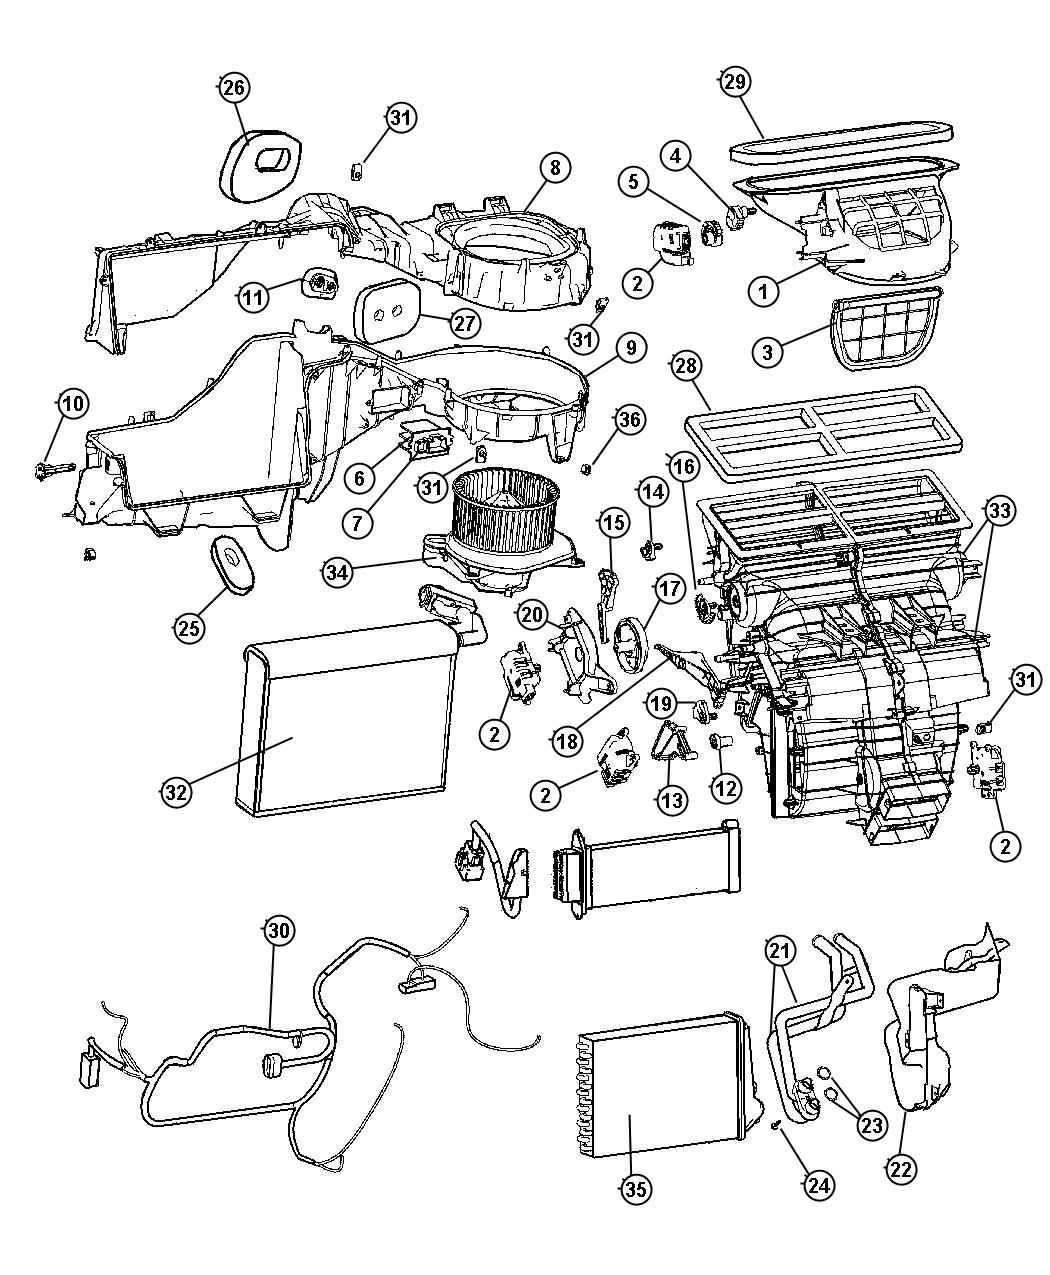 2006 Jeep Grand Cherokee Resistor. Blower motor